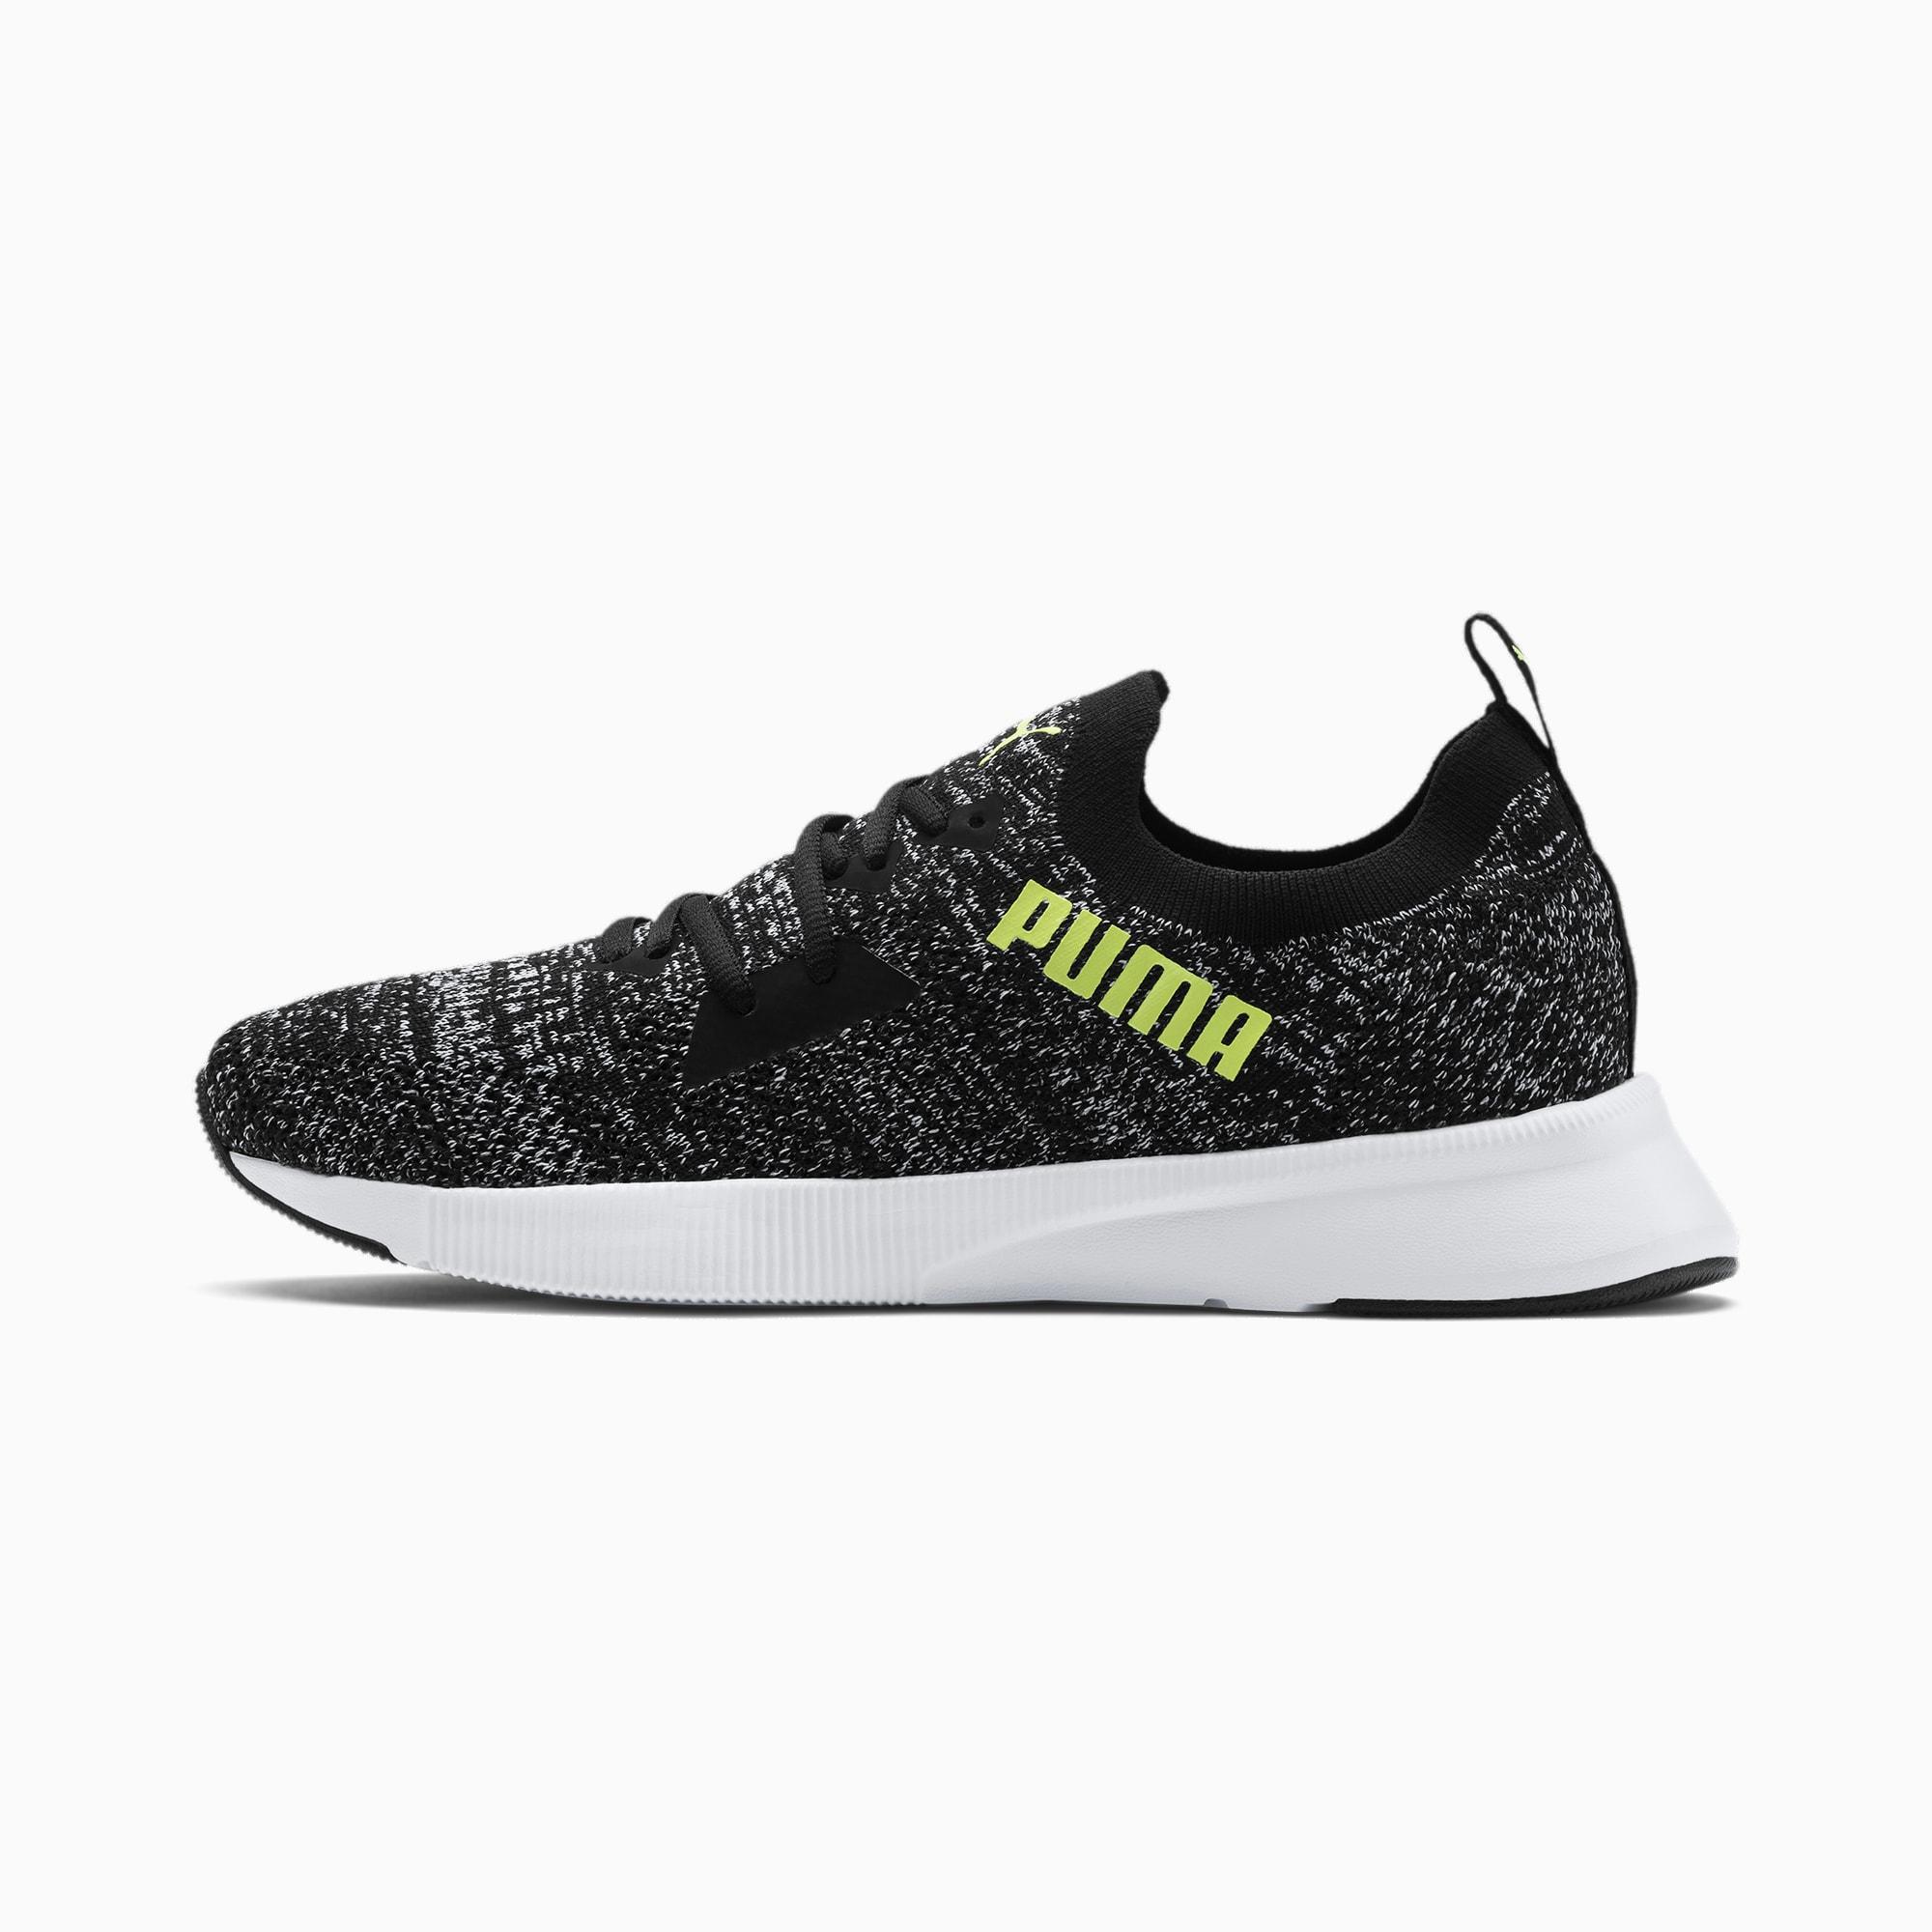 Chaussures de course Puma Flyer Runner Engineered Knit pour Homme - Tailles 39 à 47